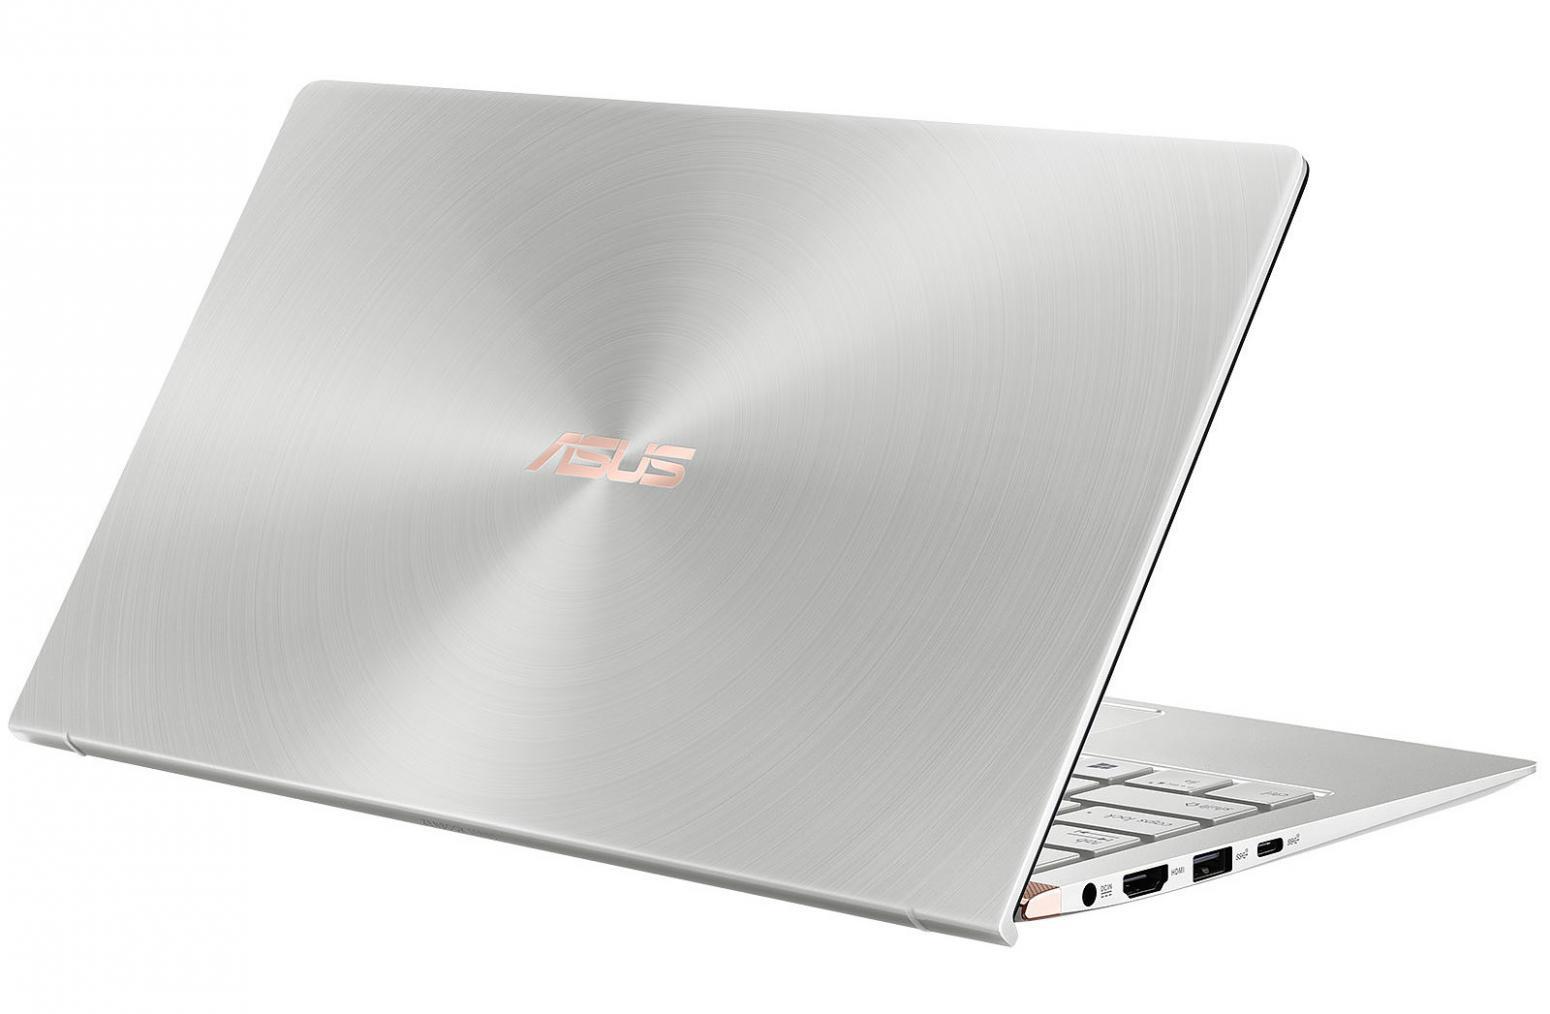 Ordinateur portable Asus Zenbook 13 UX333FA-A3132R Argent - NumPad, Pro - photo 4